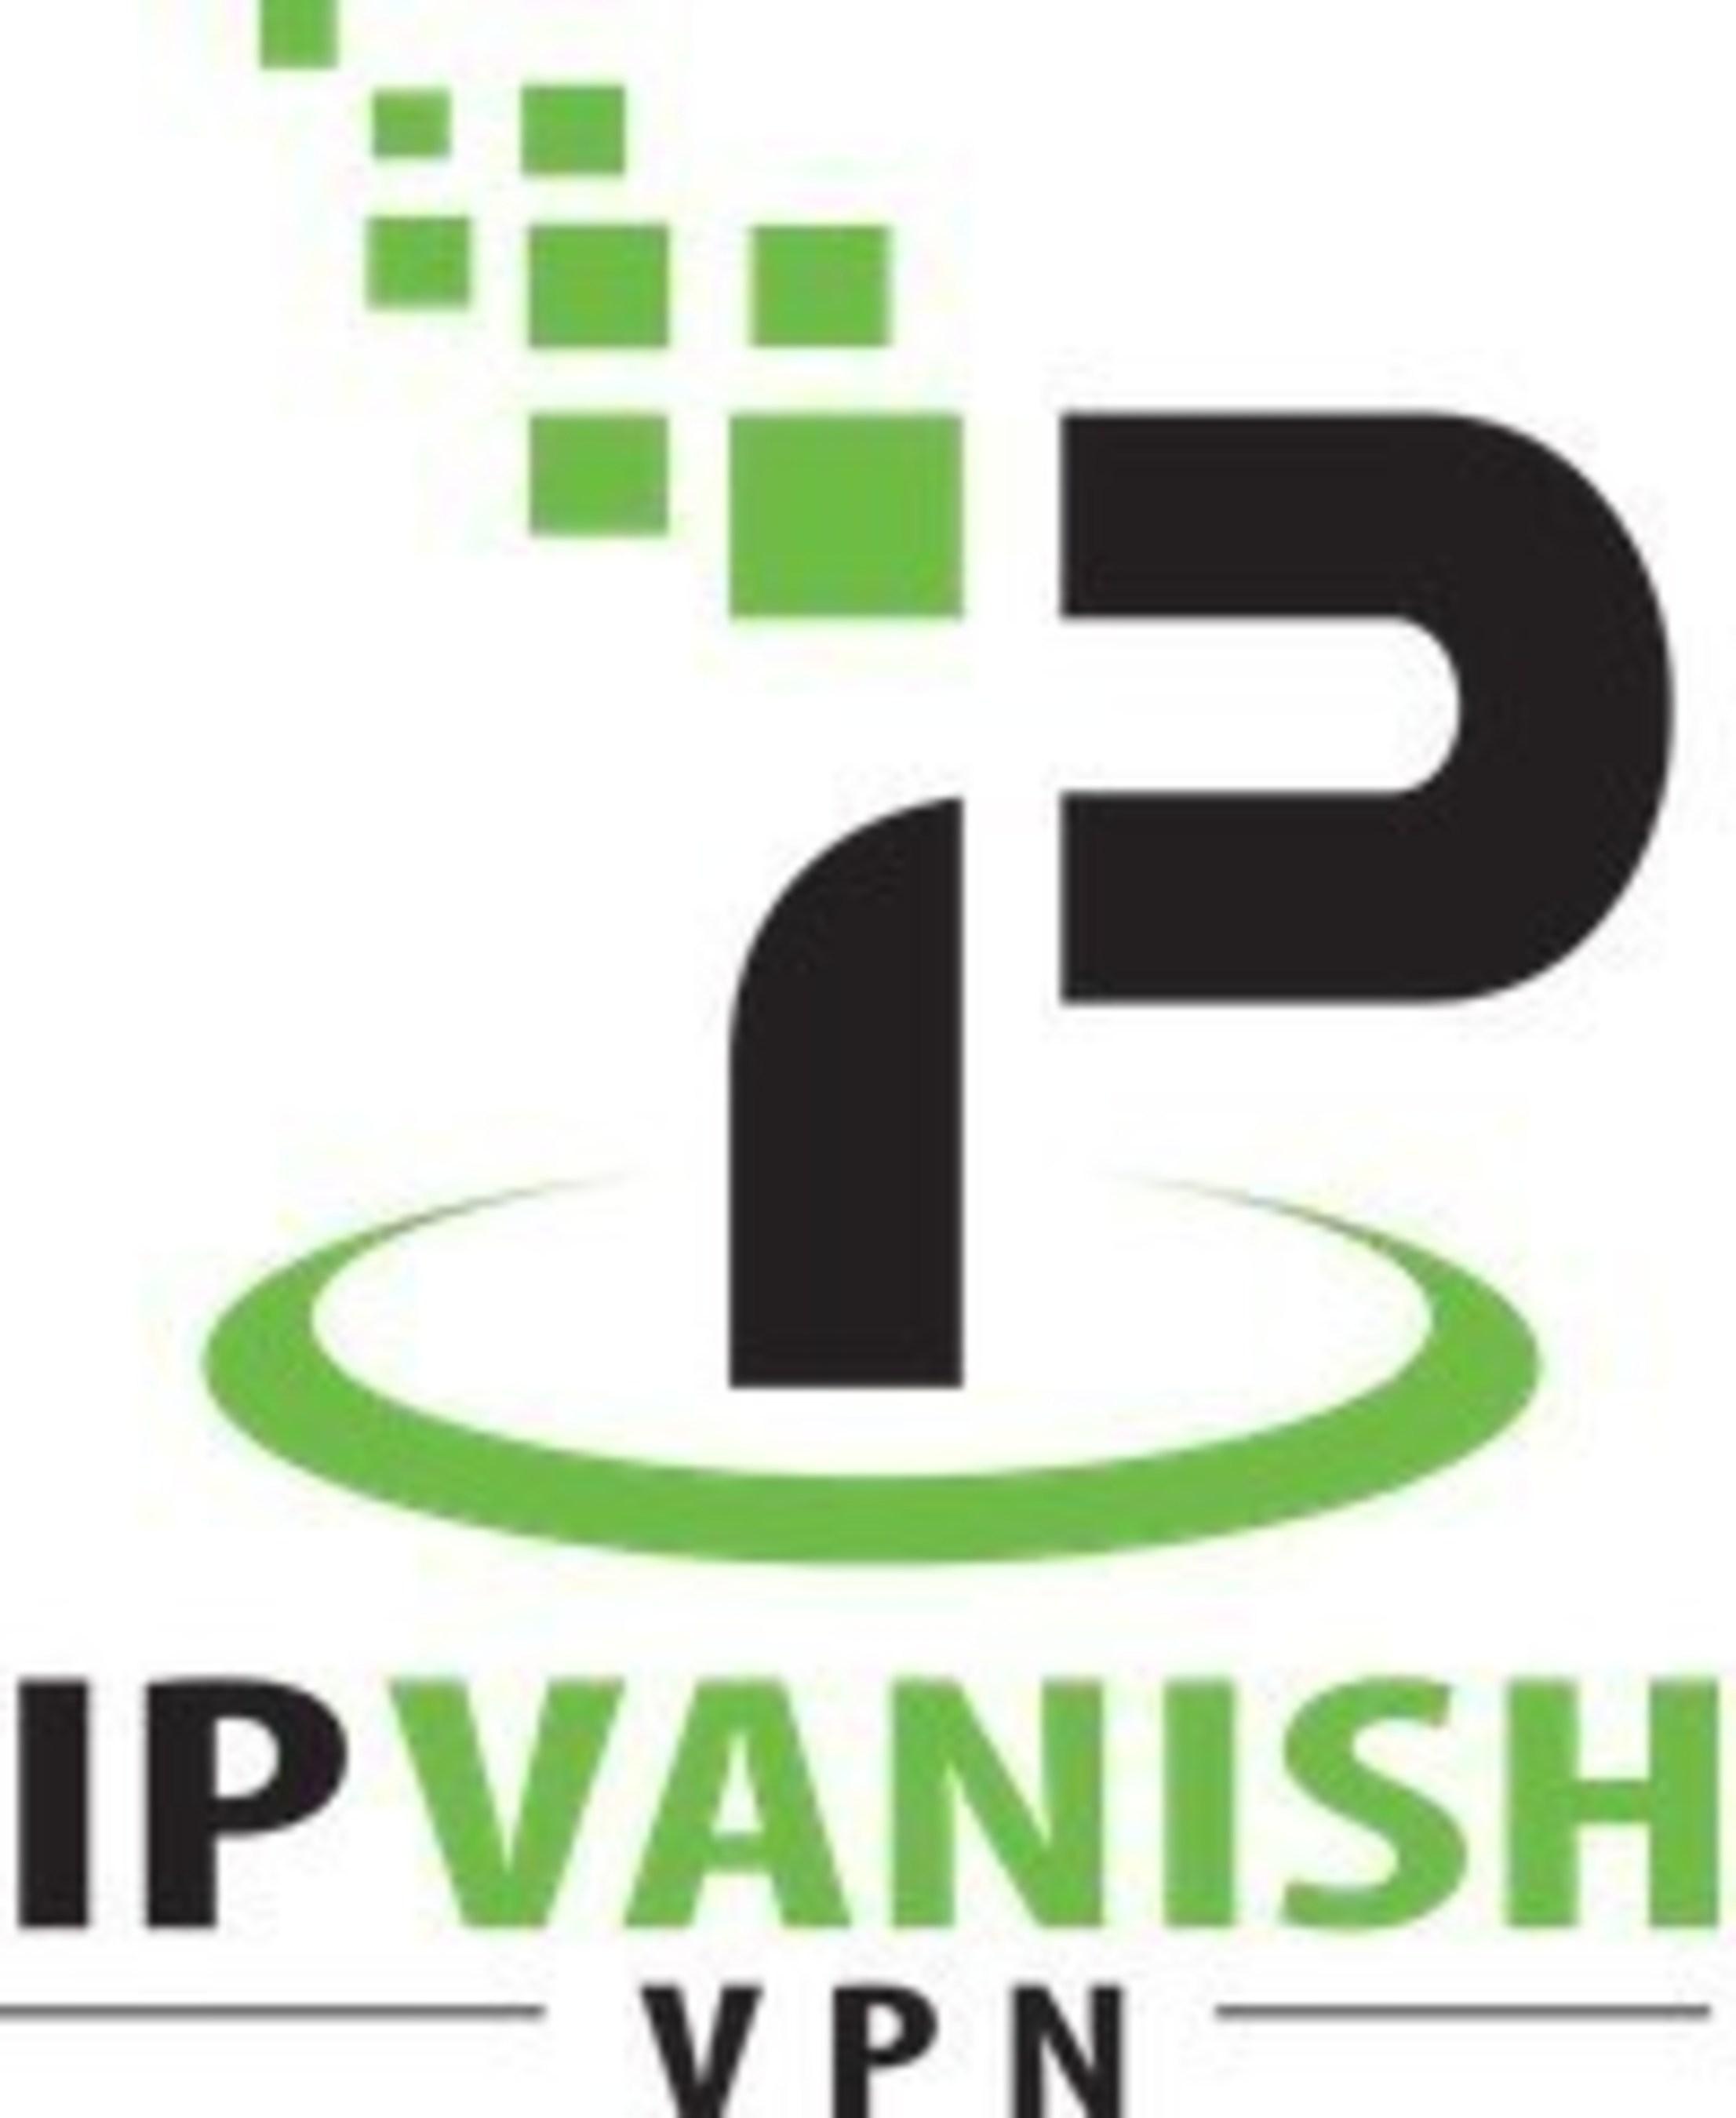 IPVanish VPN Unveils #StandUpForSecurity to Support Apple Encryption